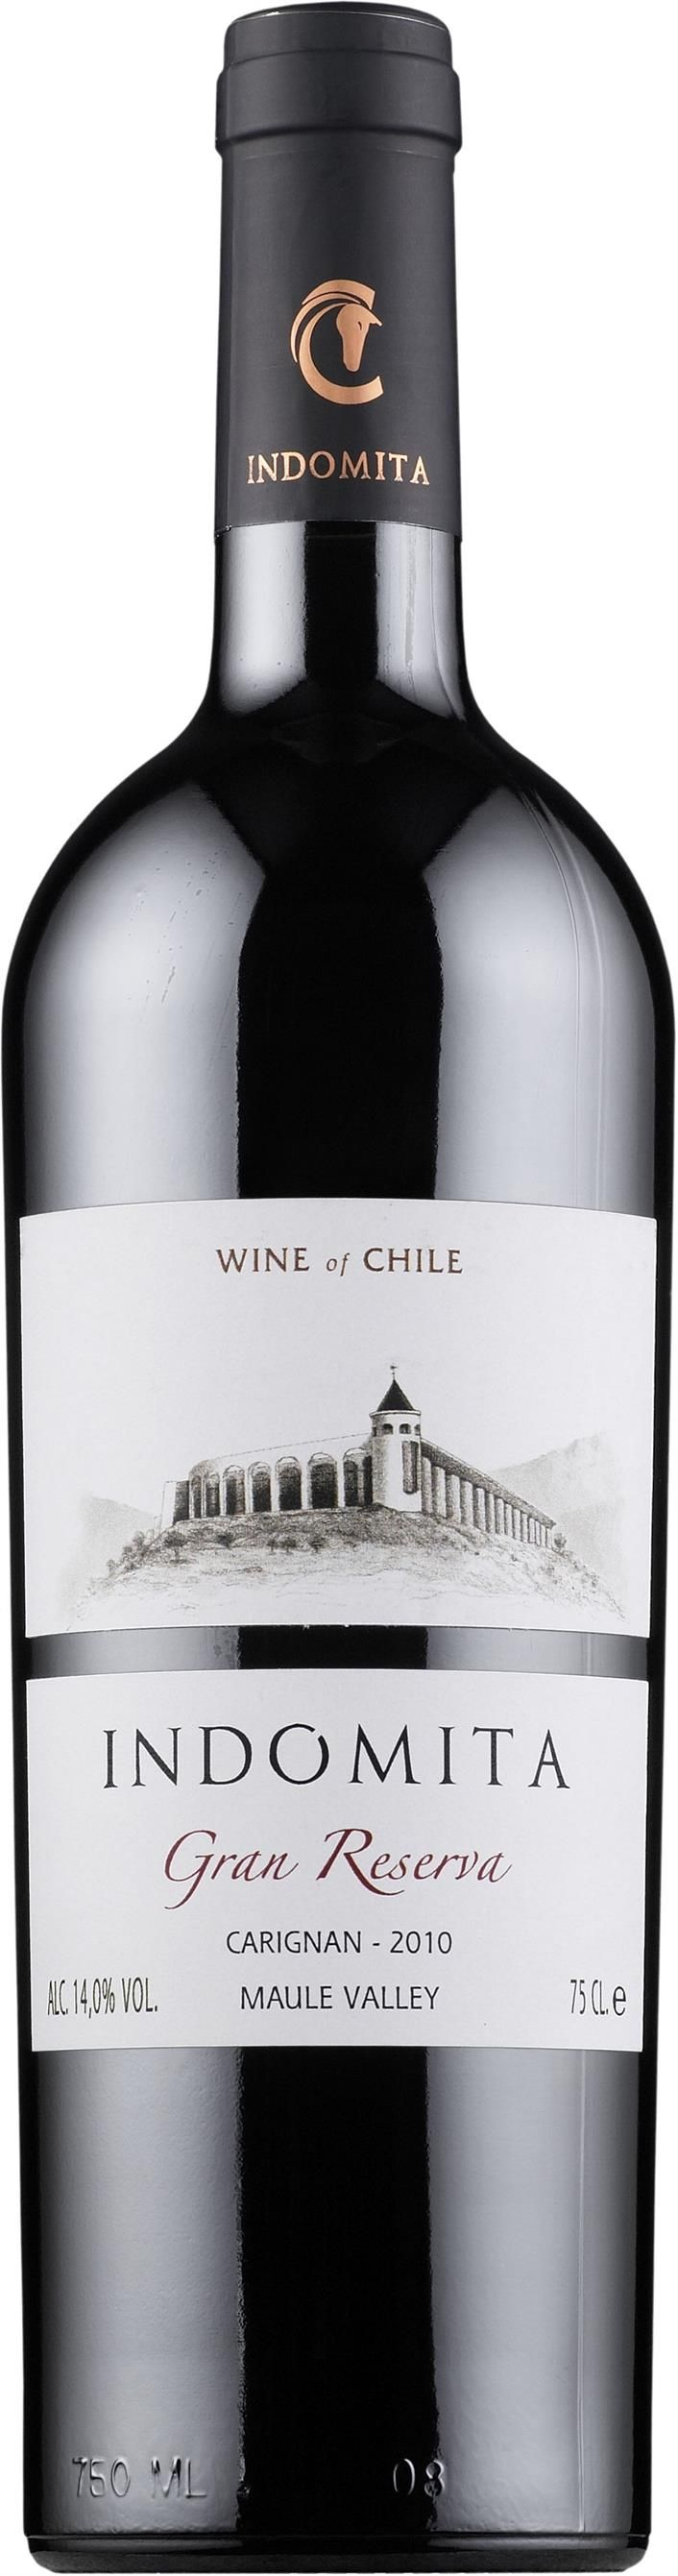 Carignan / 15% Cabernet sauvignon 2014 *Indomita Gran Reserva* - Viña Indomita, Región de Aconcagua, Chile------ Terroir: Valle del Maule - Región Central, Chile